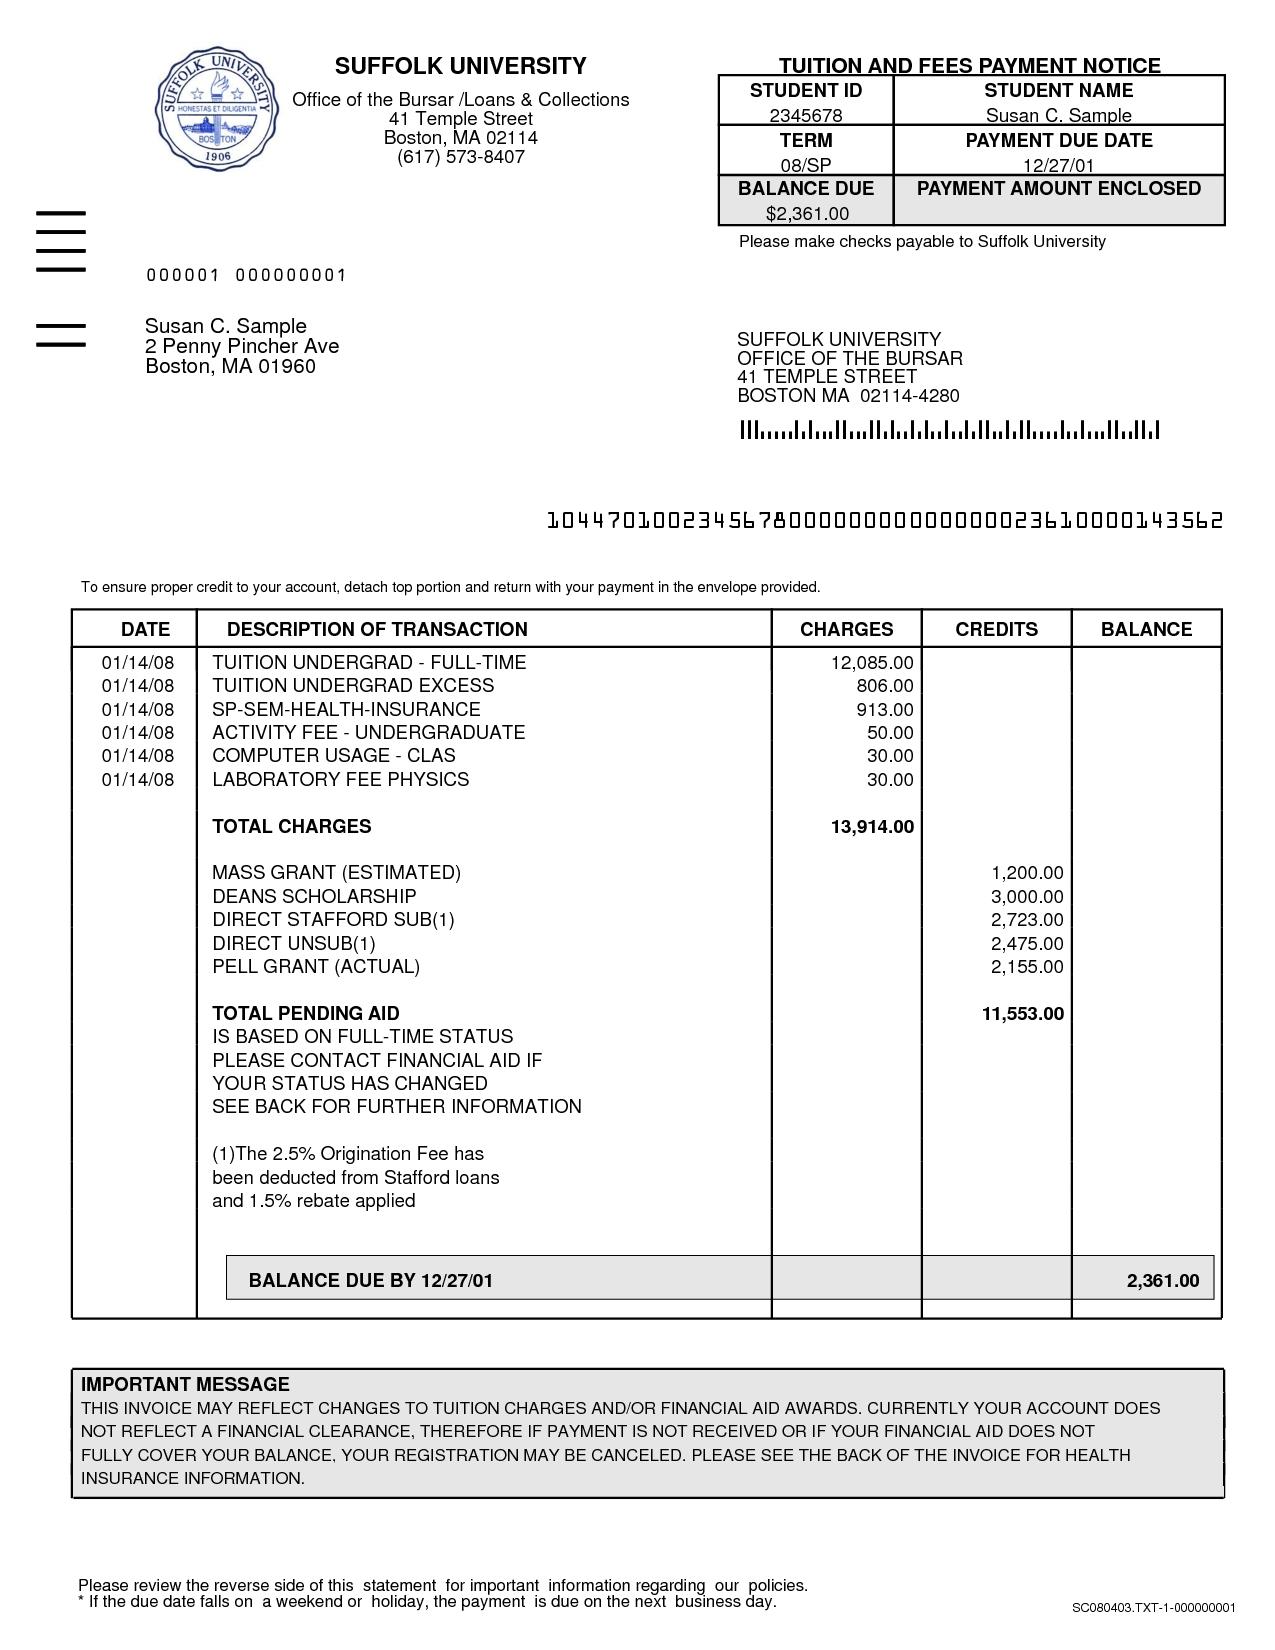 Sample Attorney Invoice